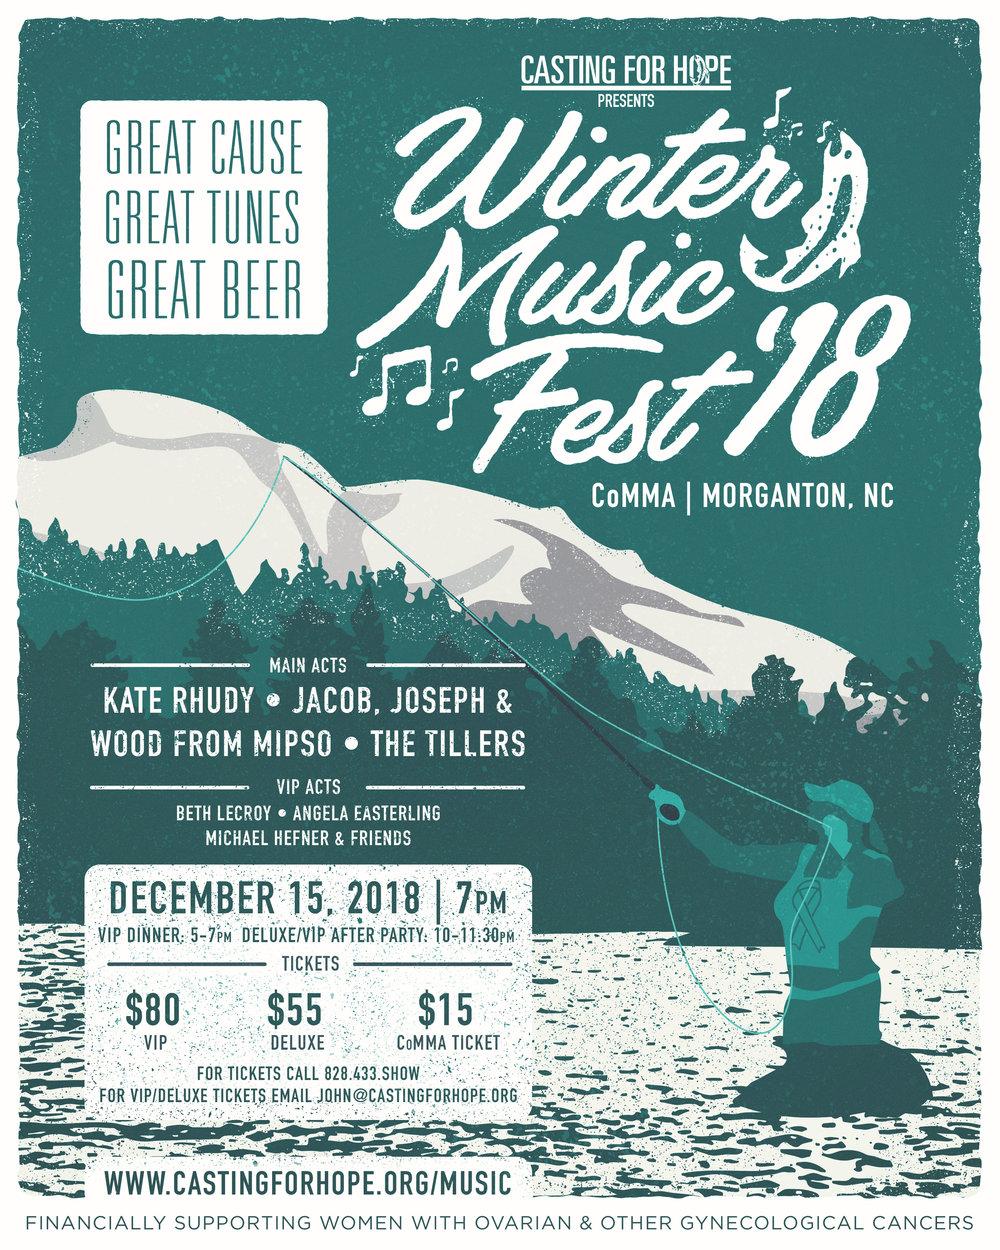 CFH_2018_WinterMusic_Poster.jpg